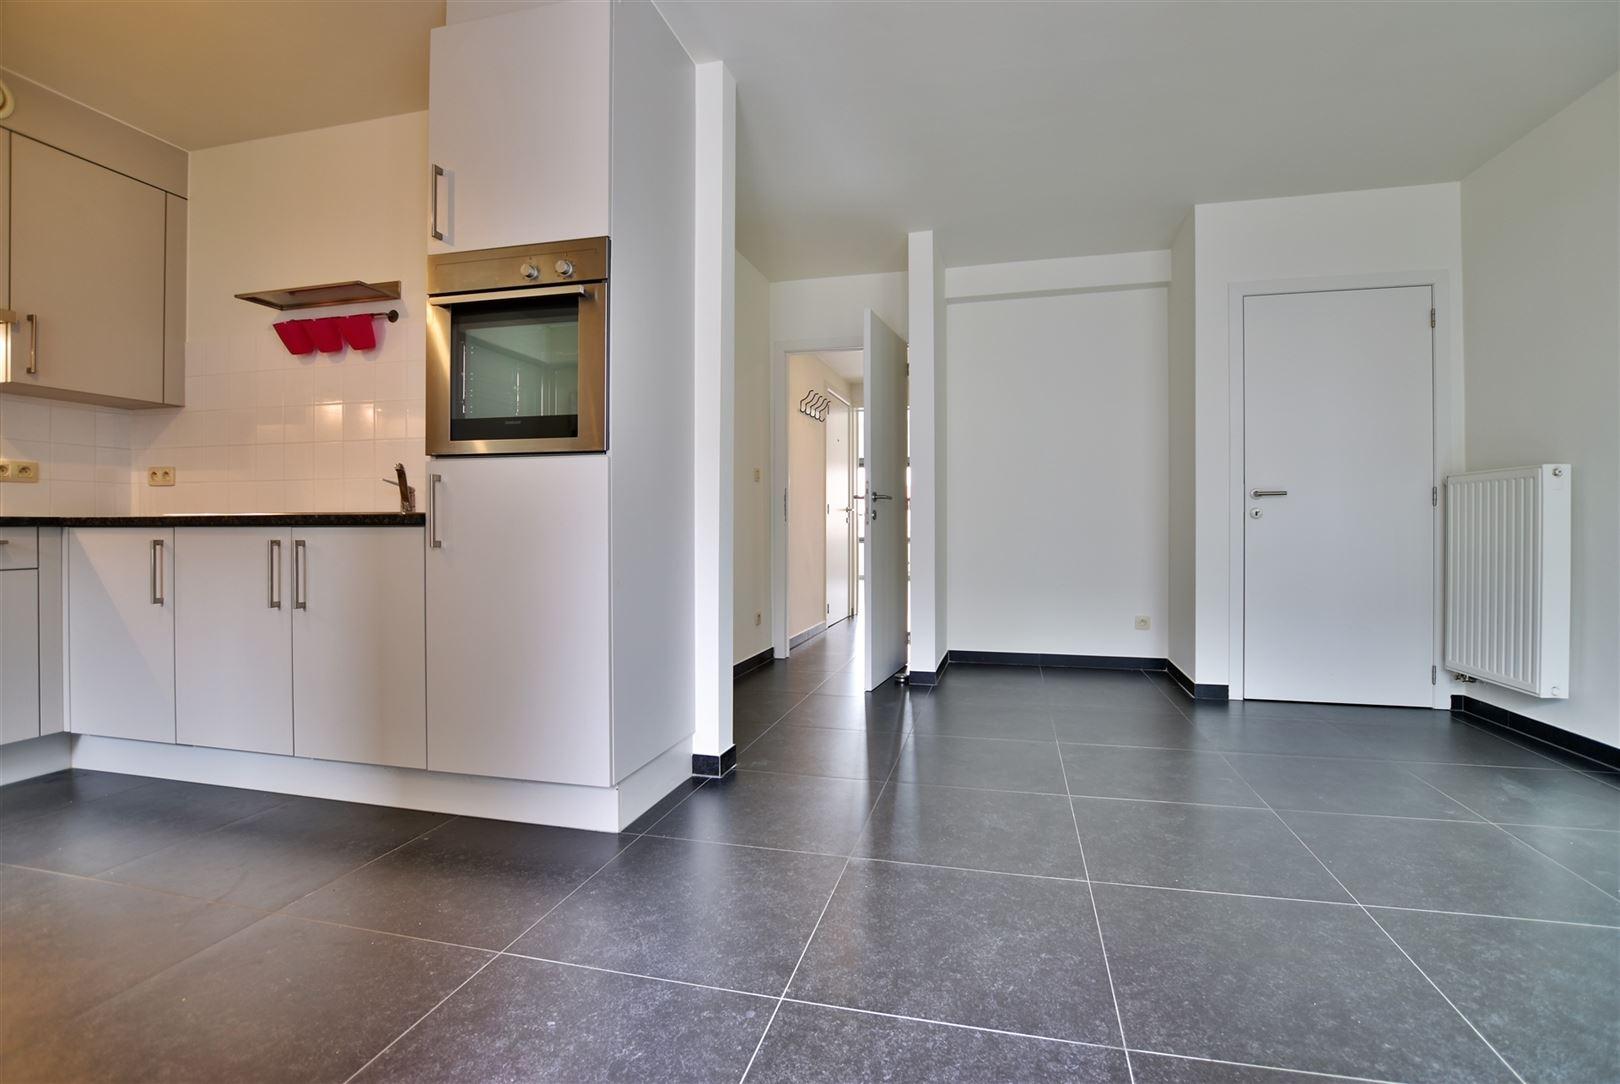 Foto 6 : Duplex/Penthouse te 9200 Sint-Gillis-bij-Dendermonde (België) - Prijs € 278.000